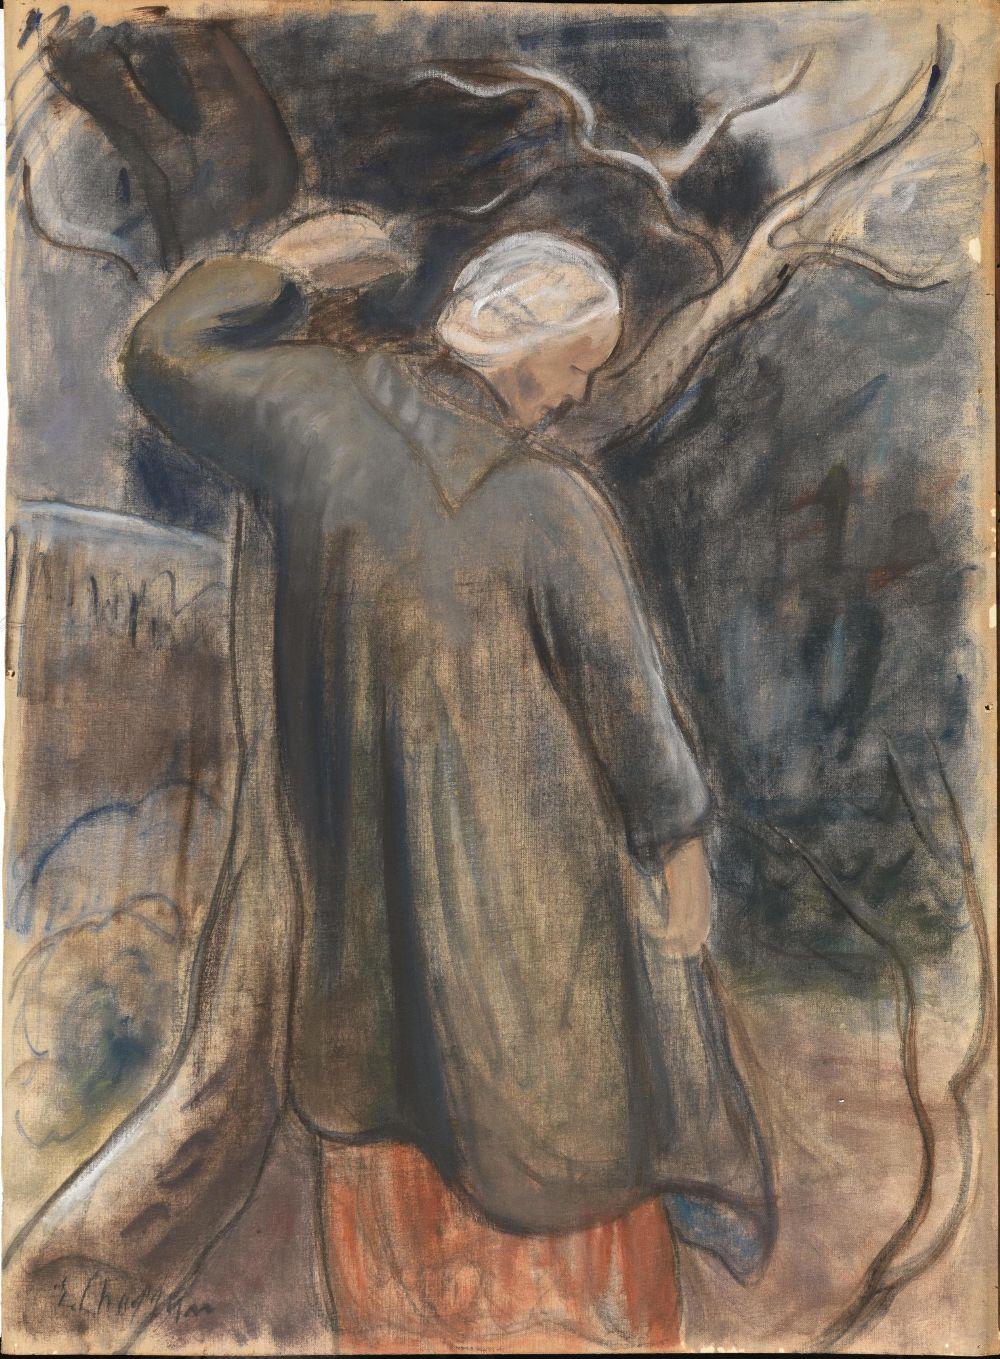 Lot 259 - Chaplin, Elisabeth (Fontainebleau 1890 - Firenze 1982)INVERNO. Olio su cartone telato. mm 687x510.